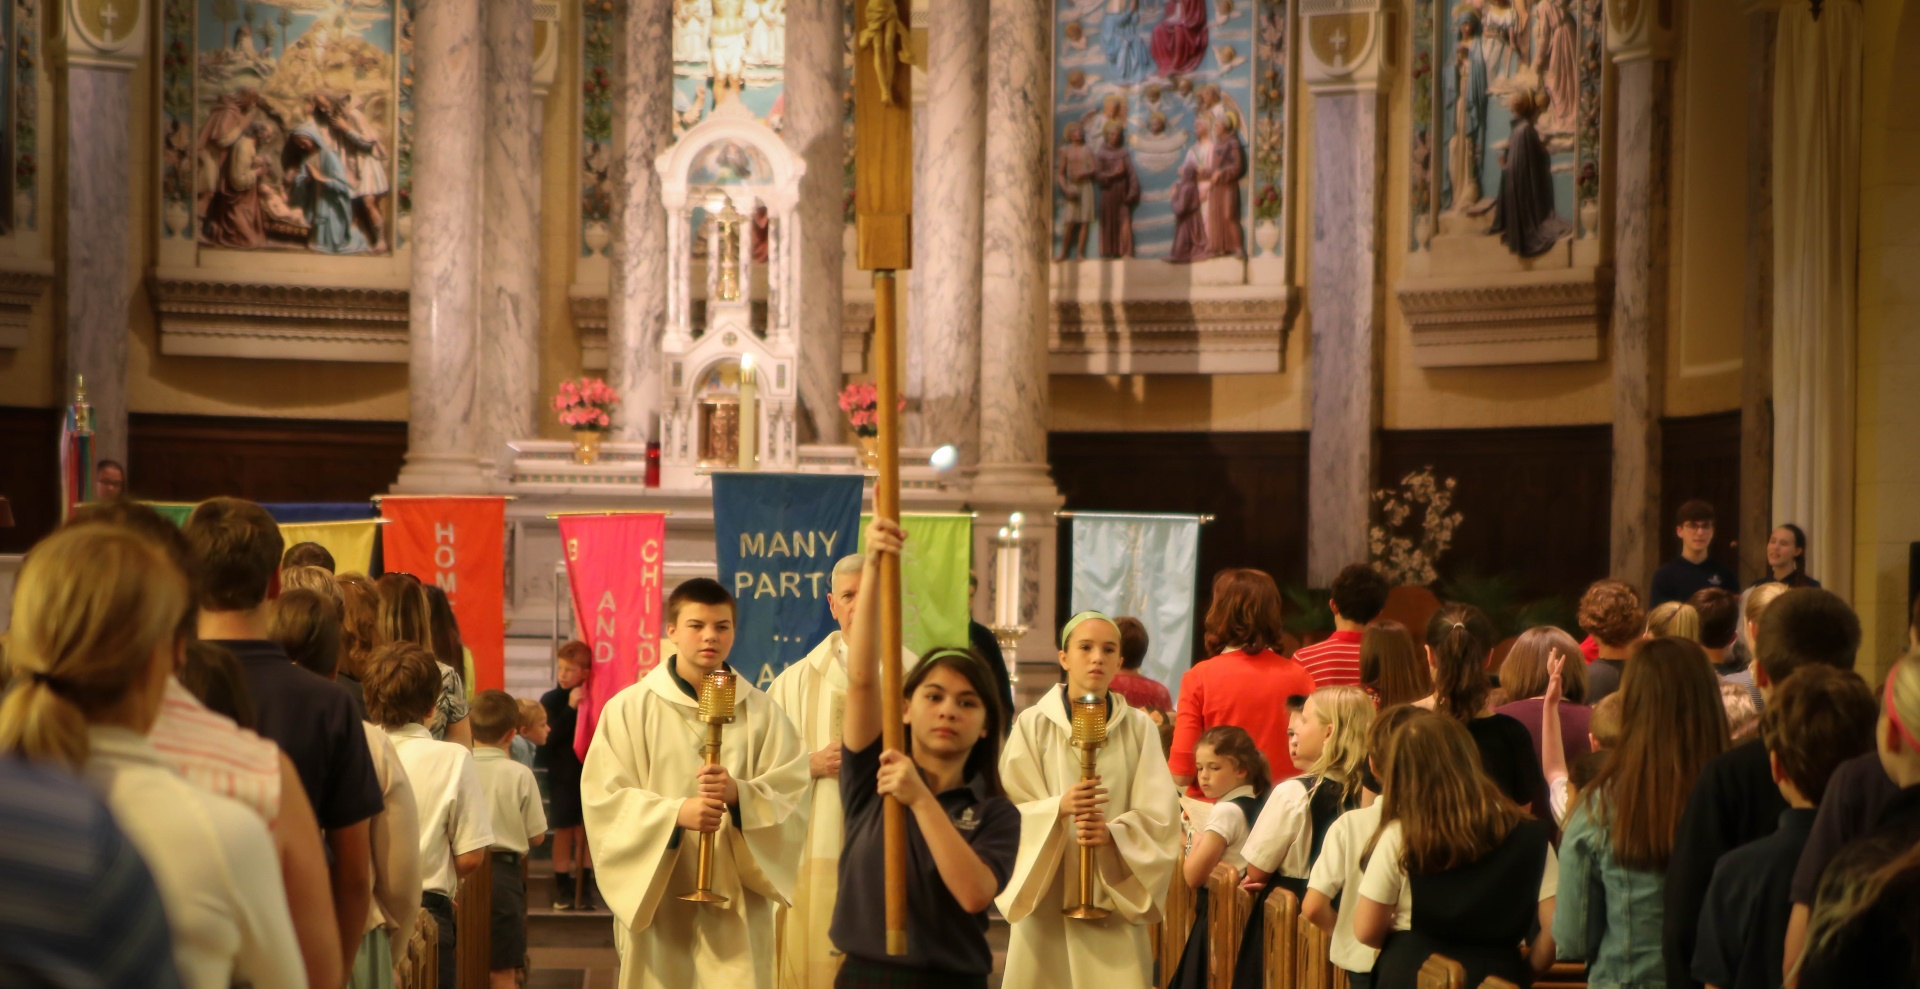 Church – Saint Agnes Catholic Community